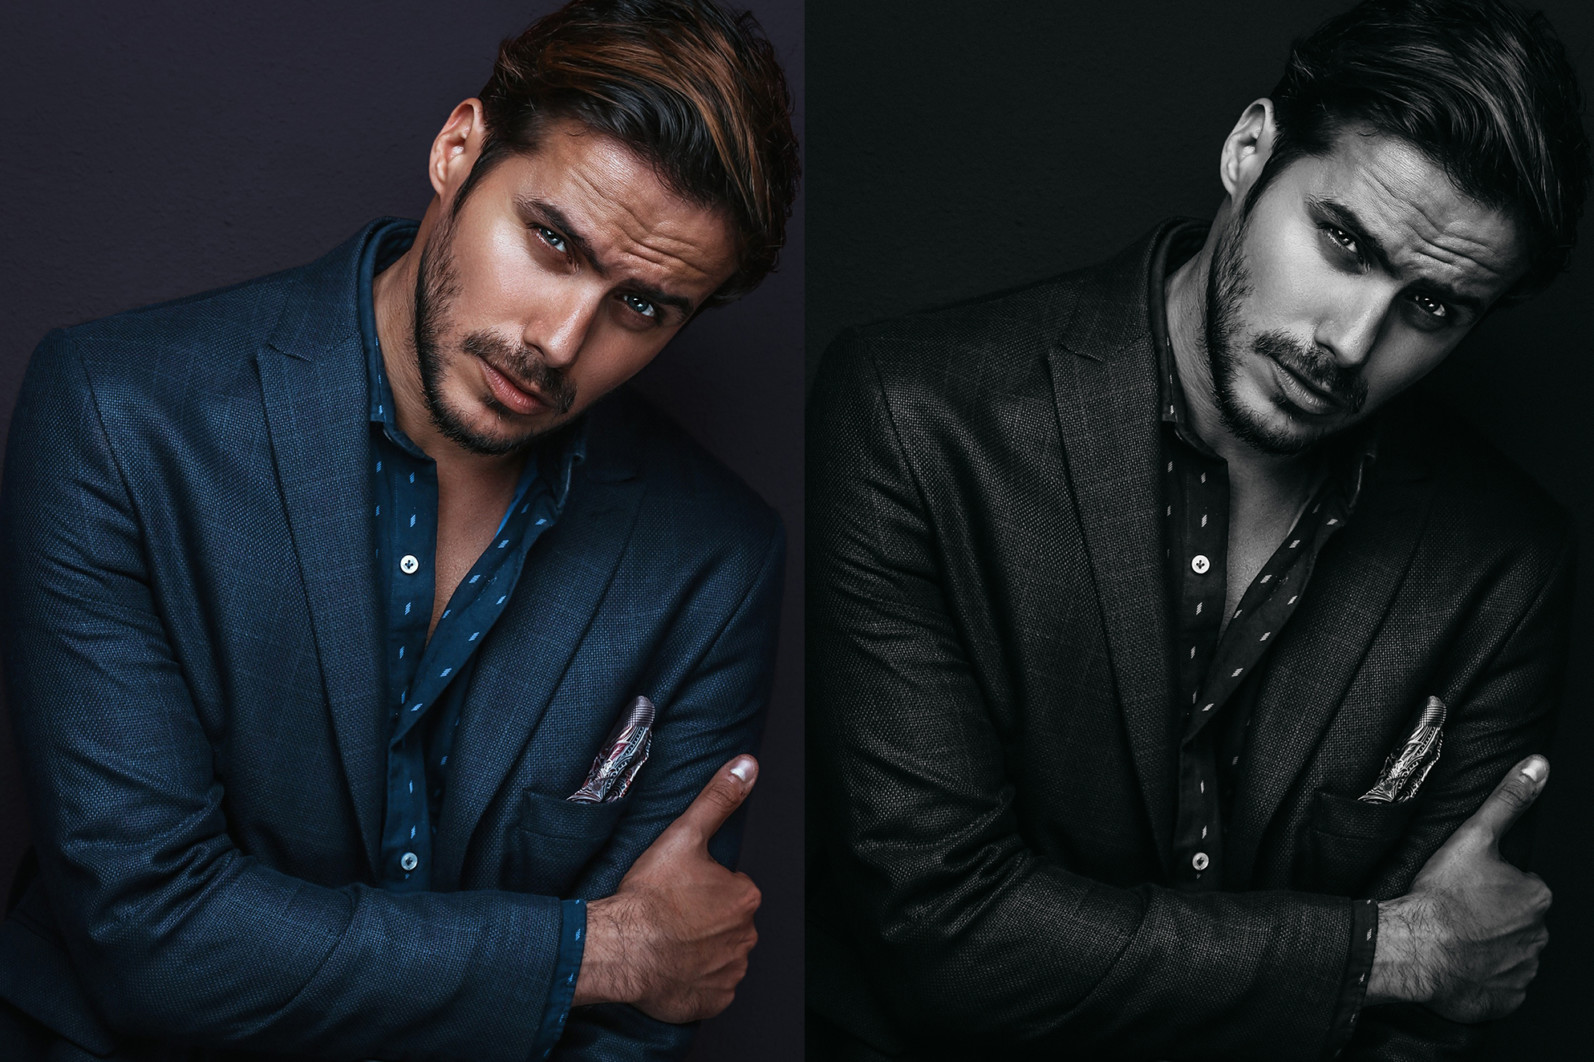 15 x Lightroom Presets, Monochrome Men Presets, Black and White Presets, Portrait Presets - 11 Monochrome Men 11 -